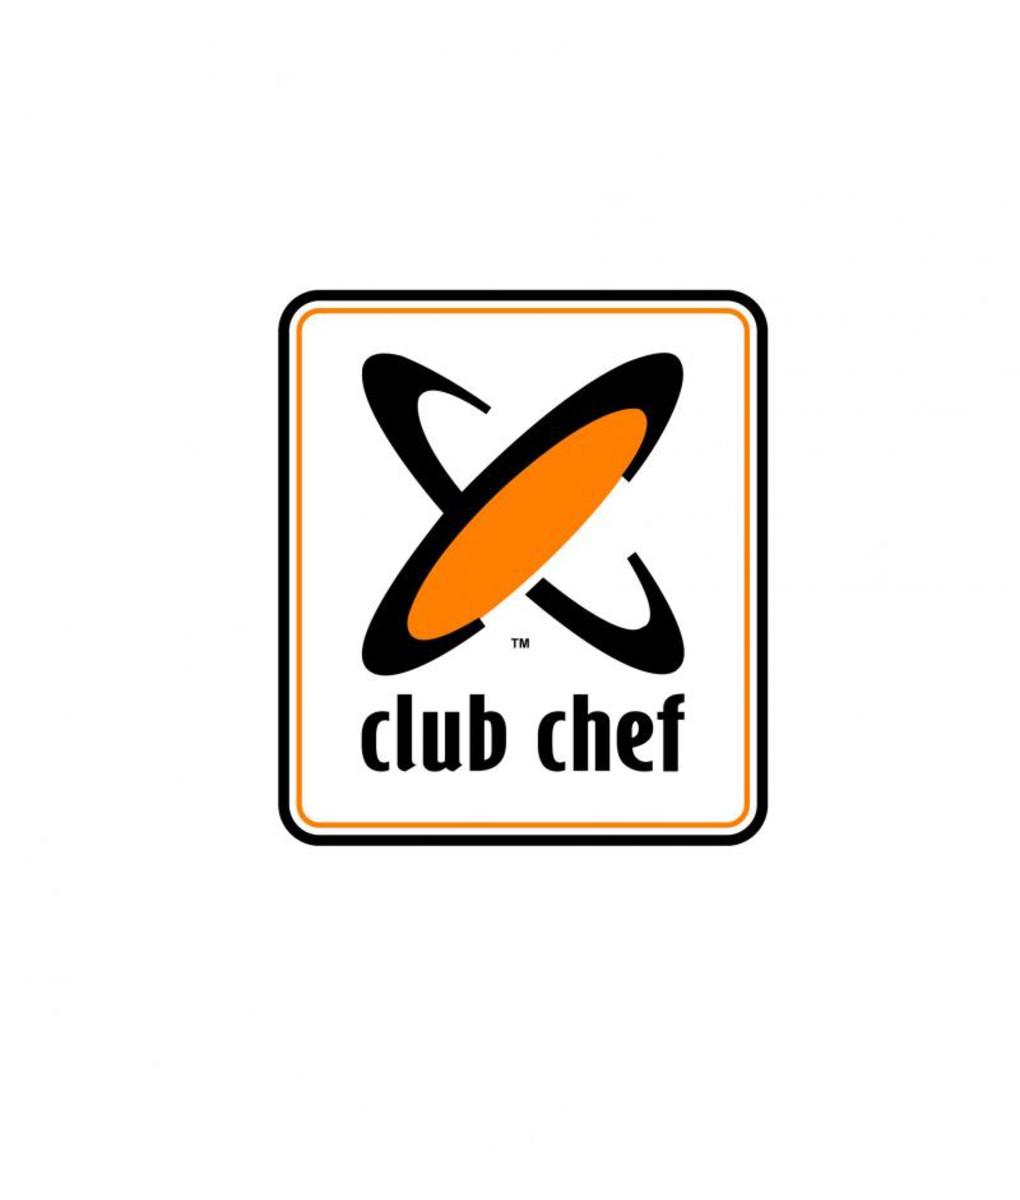 Traditional Flat Top Hat Black (Skull Cap / Pill Box) by Club Chef Chef Uniforms 3